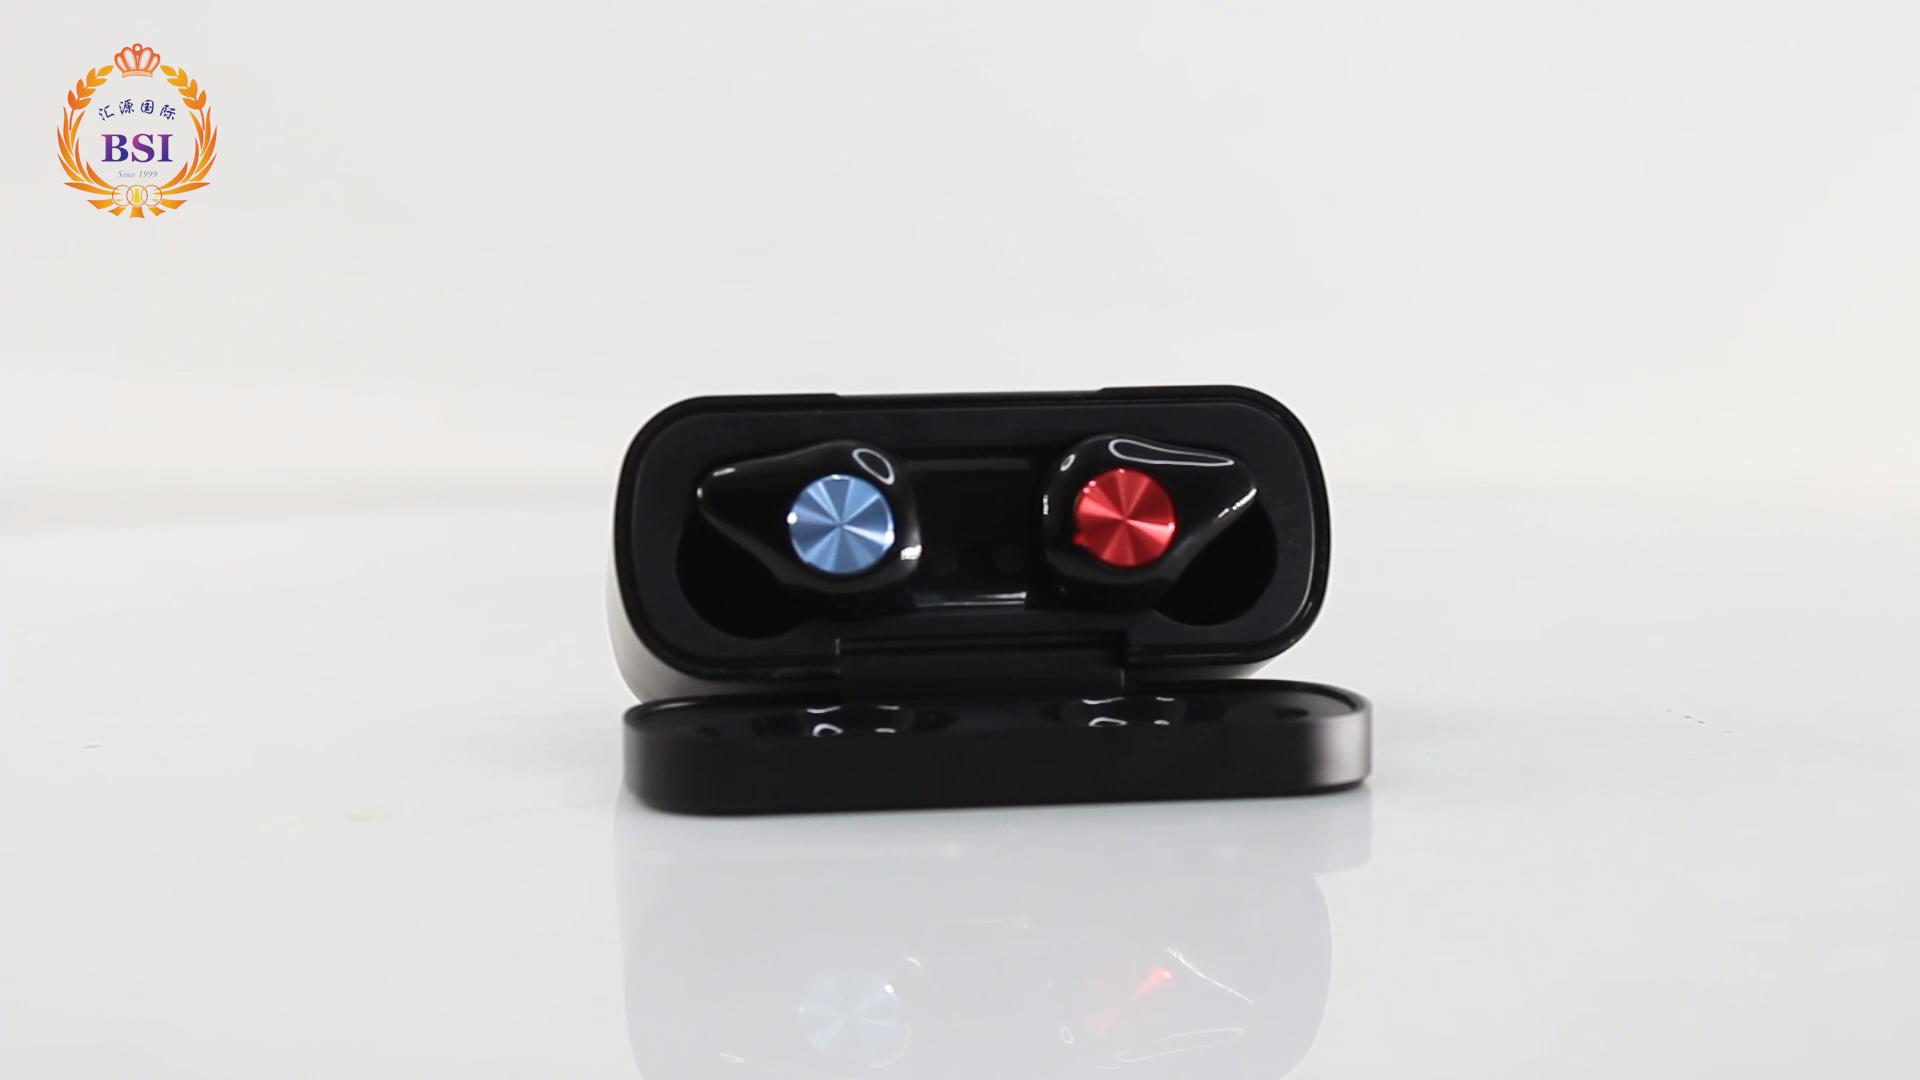 In-ear headphone true wireless earphones Two Colors Design Bluetooth 5.0 TWS earphone with touch control